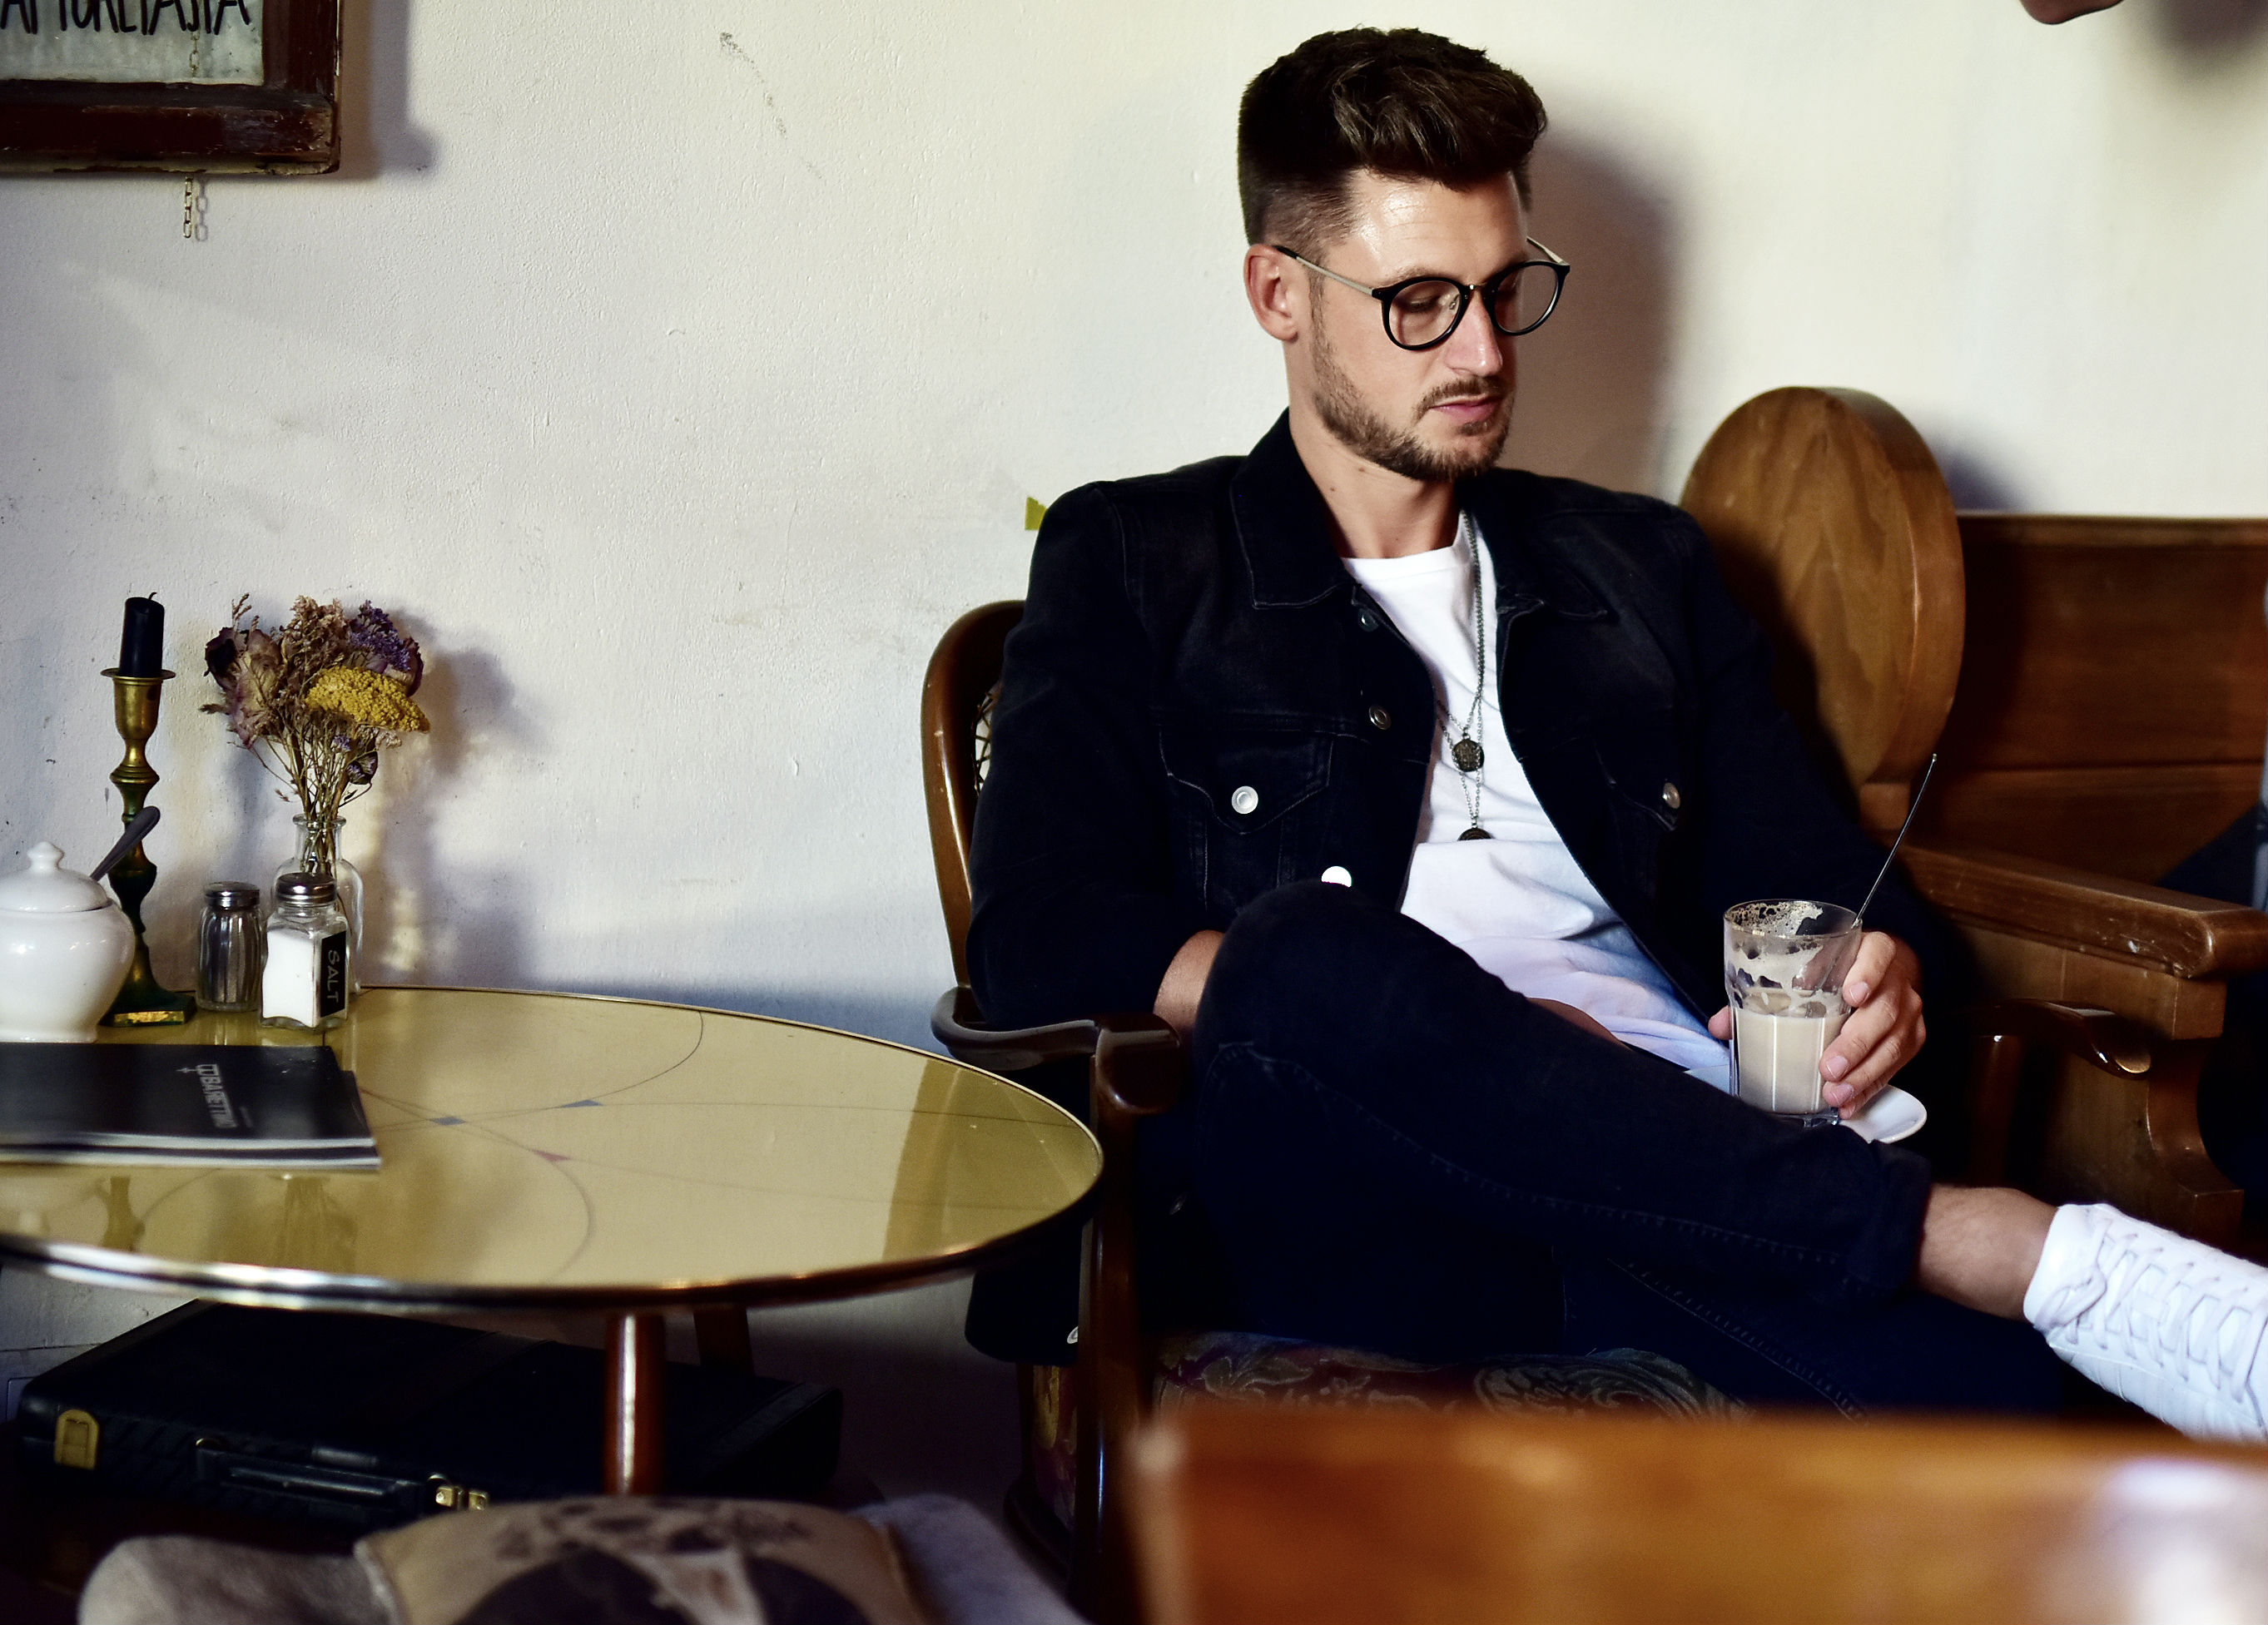 Tommeezjerry-Styleblog-Männerblog-Männer-Modeblog-Berlin-Berlinblog-Männermodeblog-Fashionblog-Cafe-Lilienthal-Uhr-Pilotwatch-Casual-Denim-Look